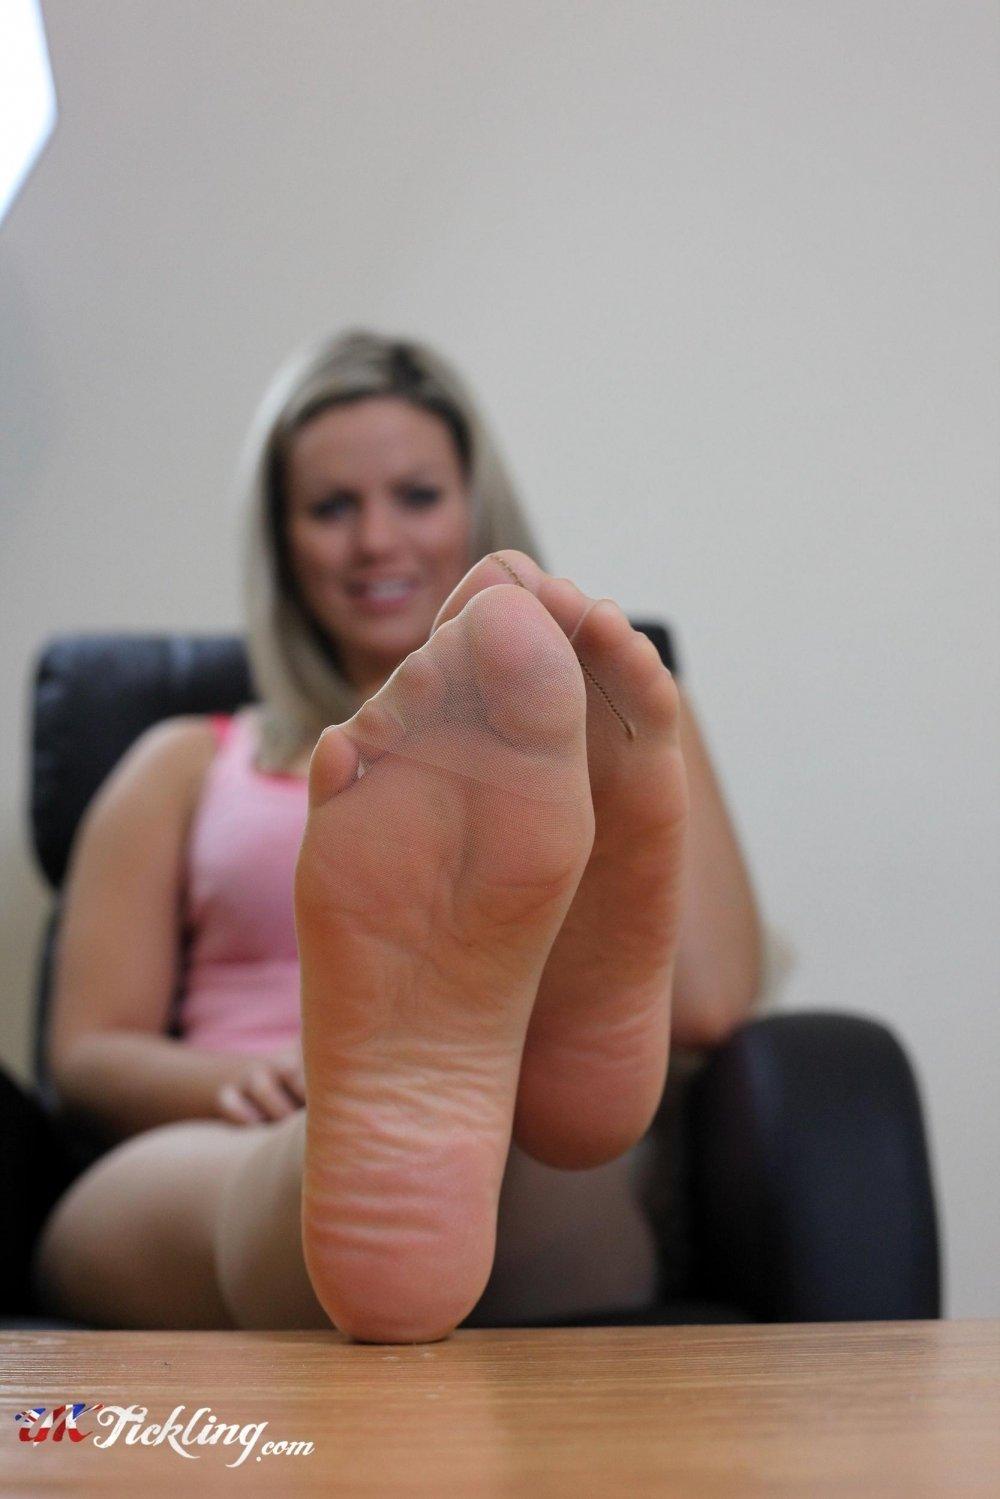 Izzy Uk Tickling Best free izzy pictures, free sex gallery @ sexybabegirls